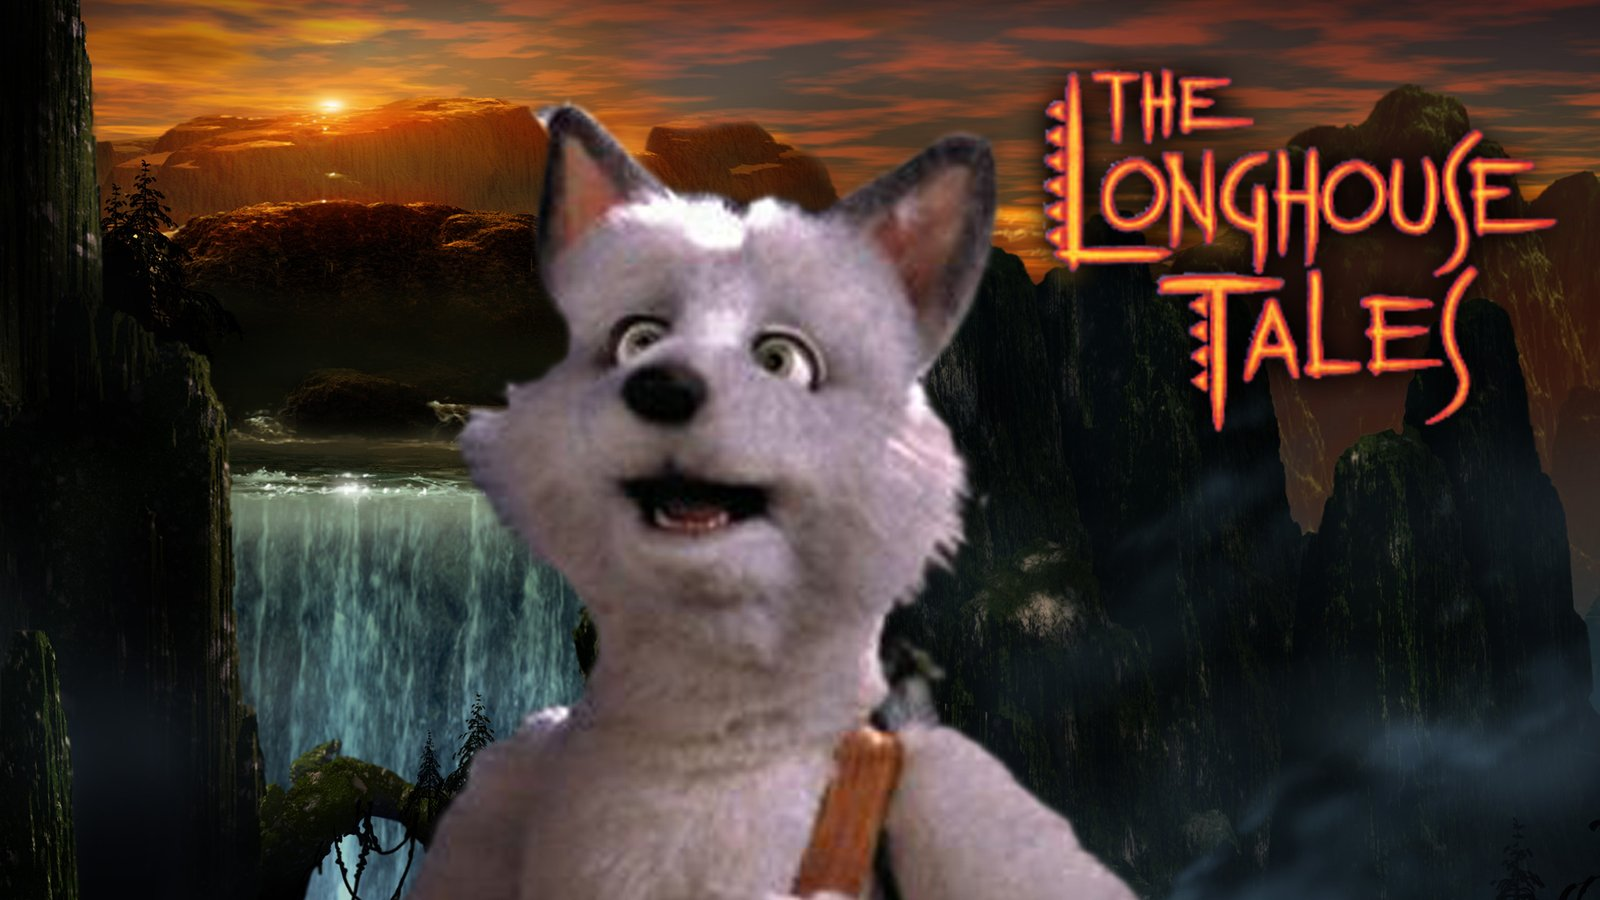 The Longhouse Tales Season 1